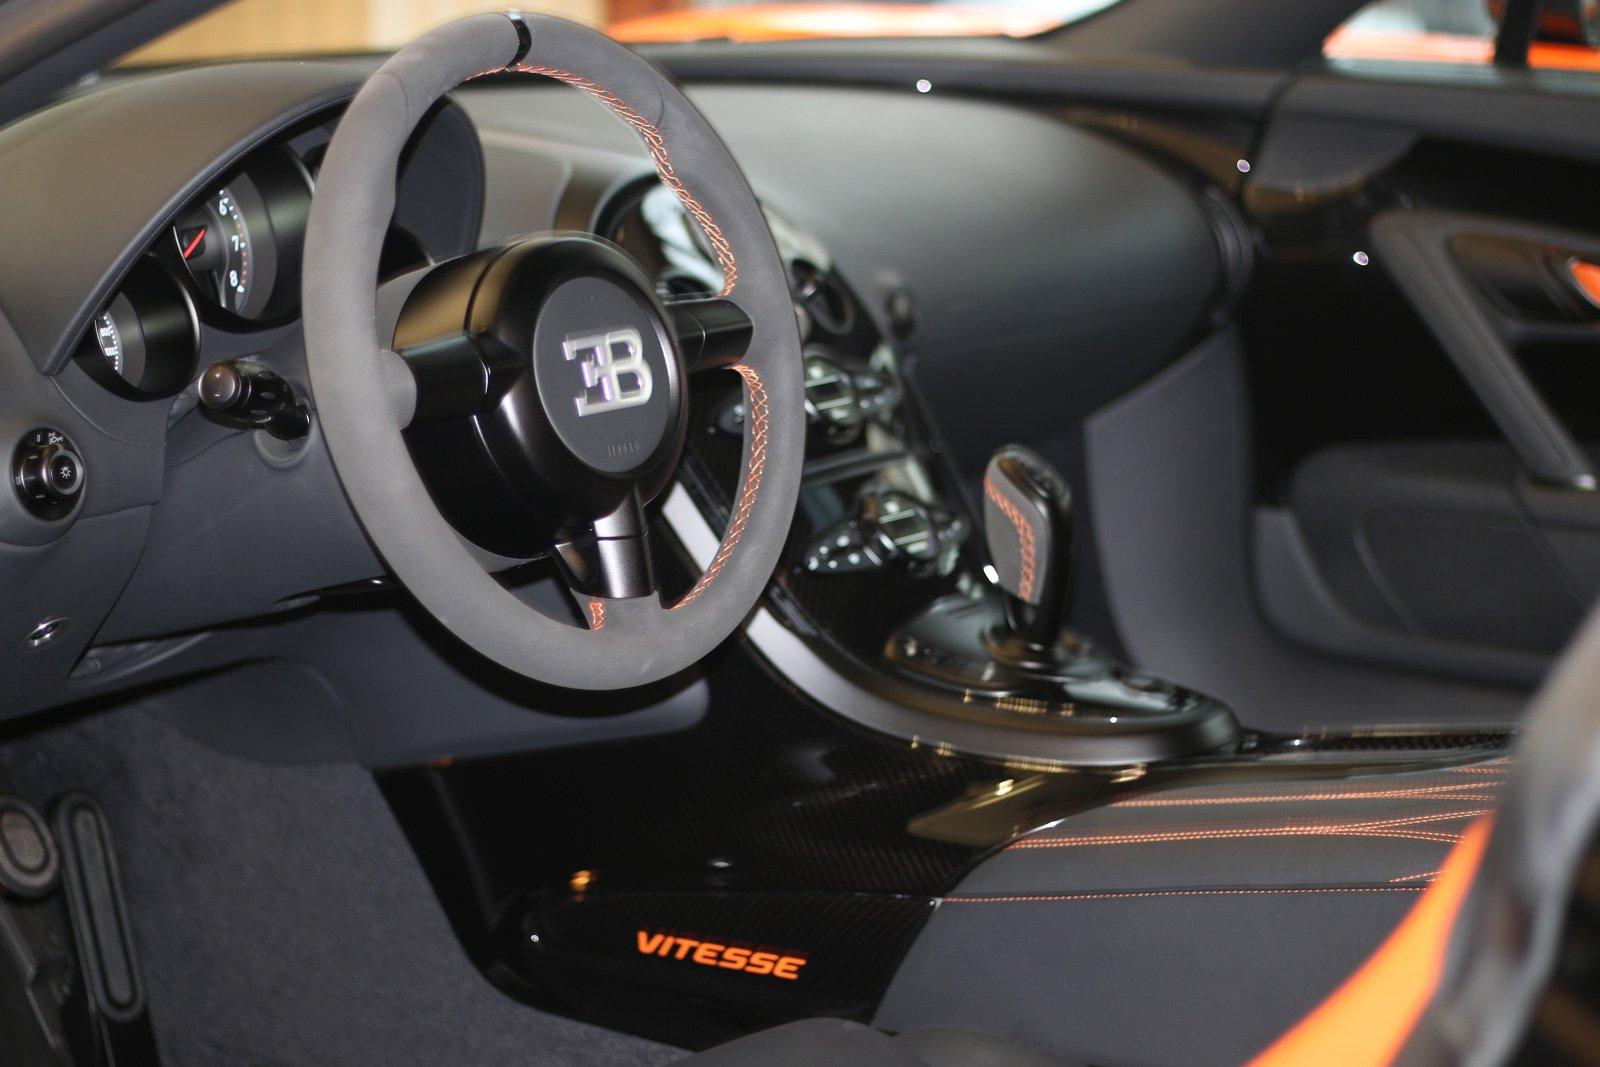 bugatti veyron world record car up for sale exotic car list. Black Bedroom Furniture Sets. Home Design Ideas